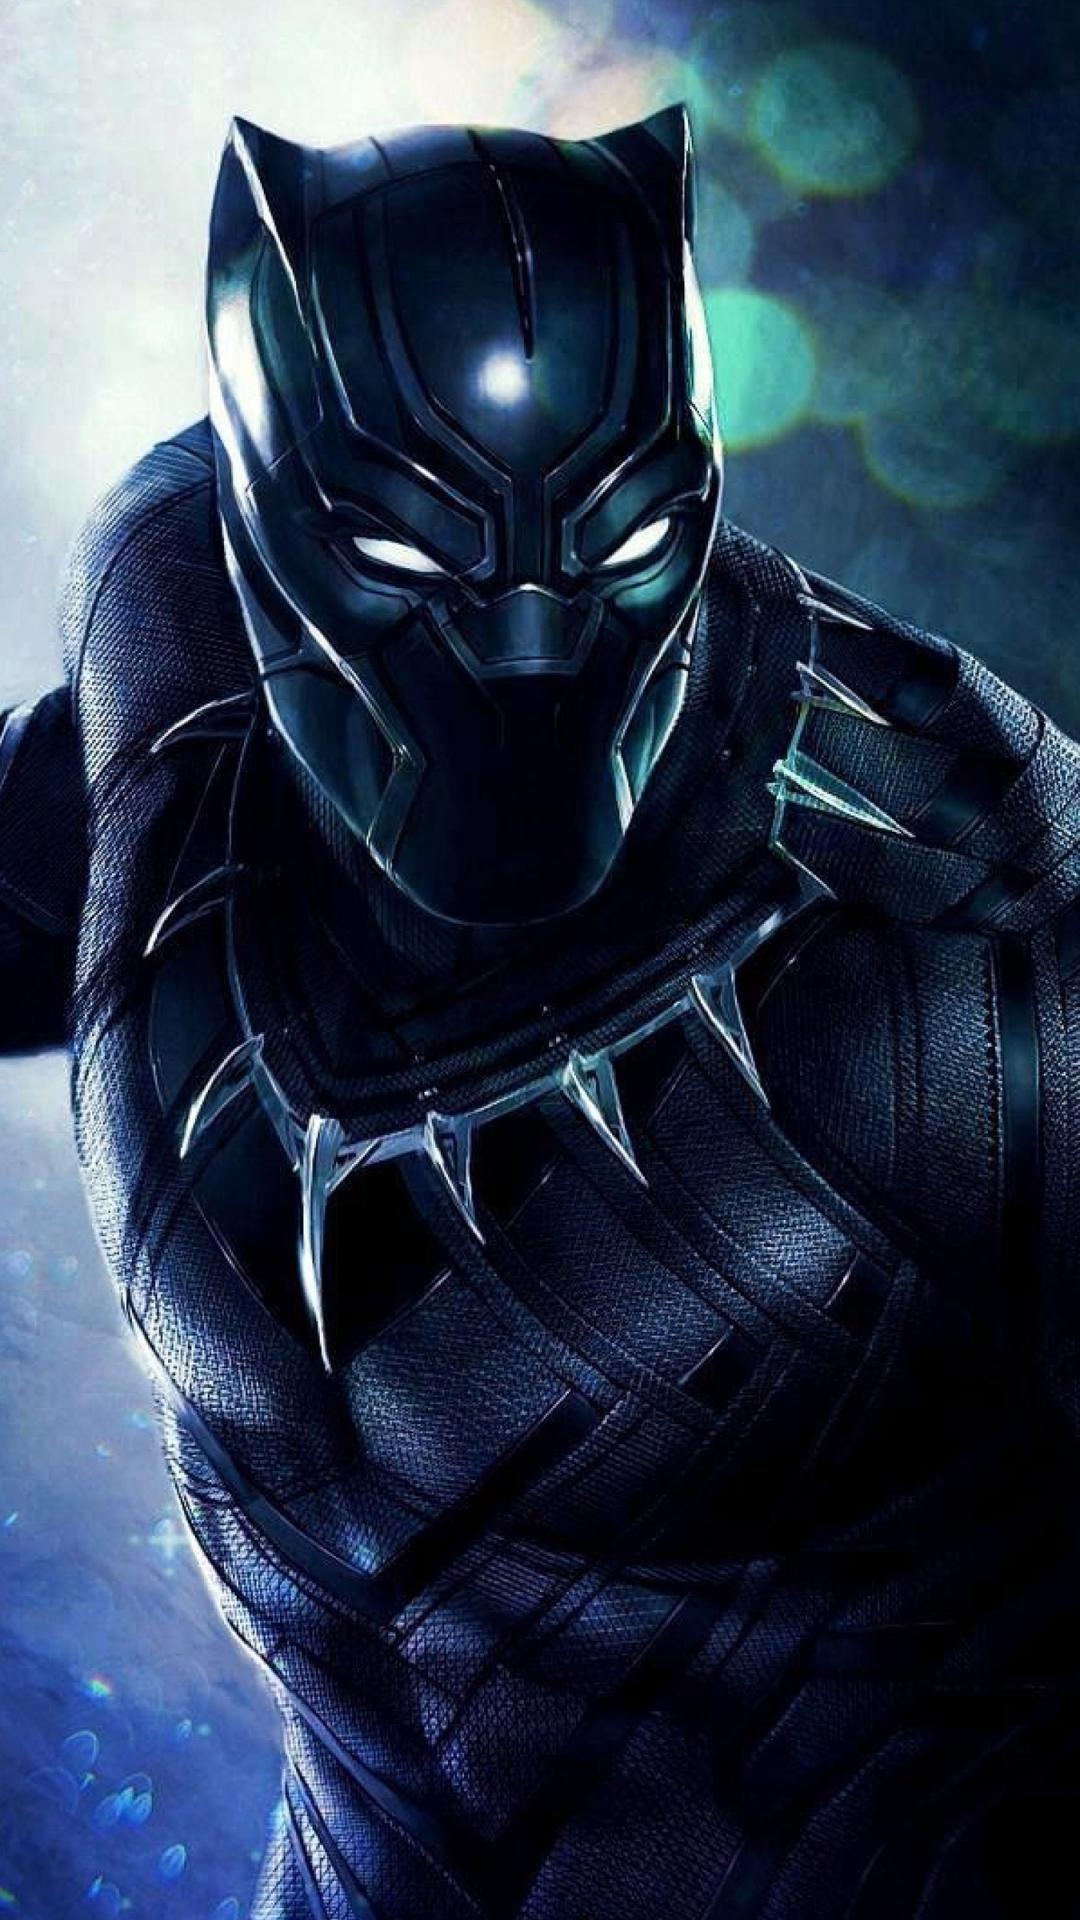 Download 1080x1920 Wallpaper Black Panther Superhero Artwork